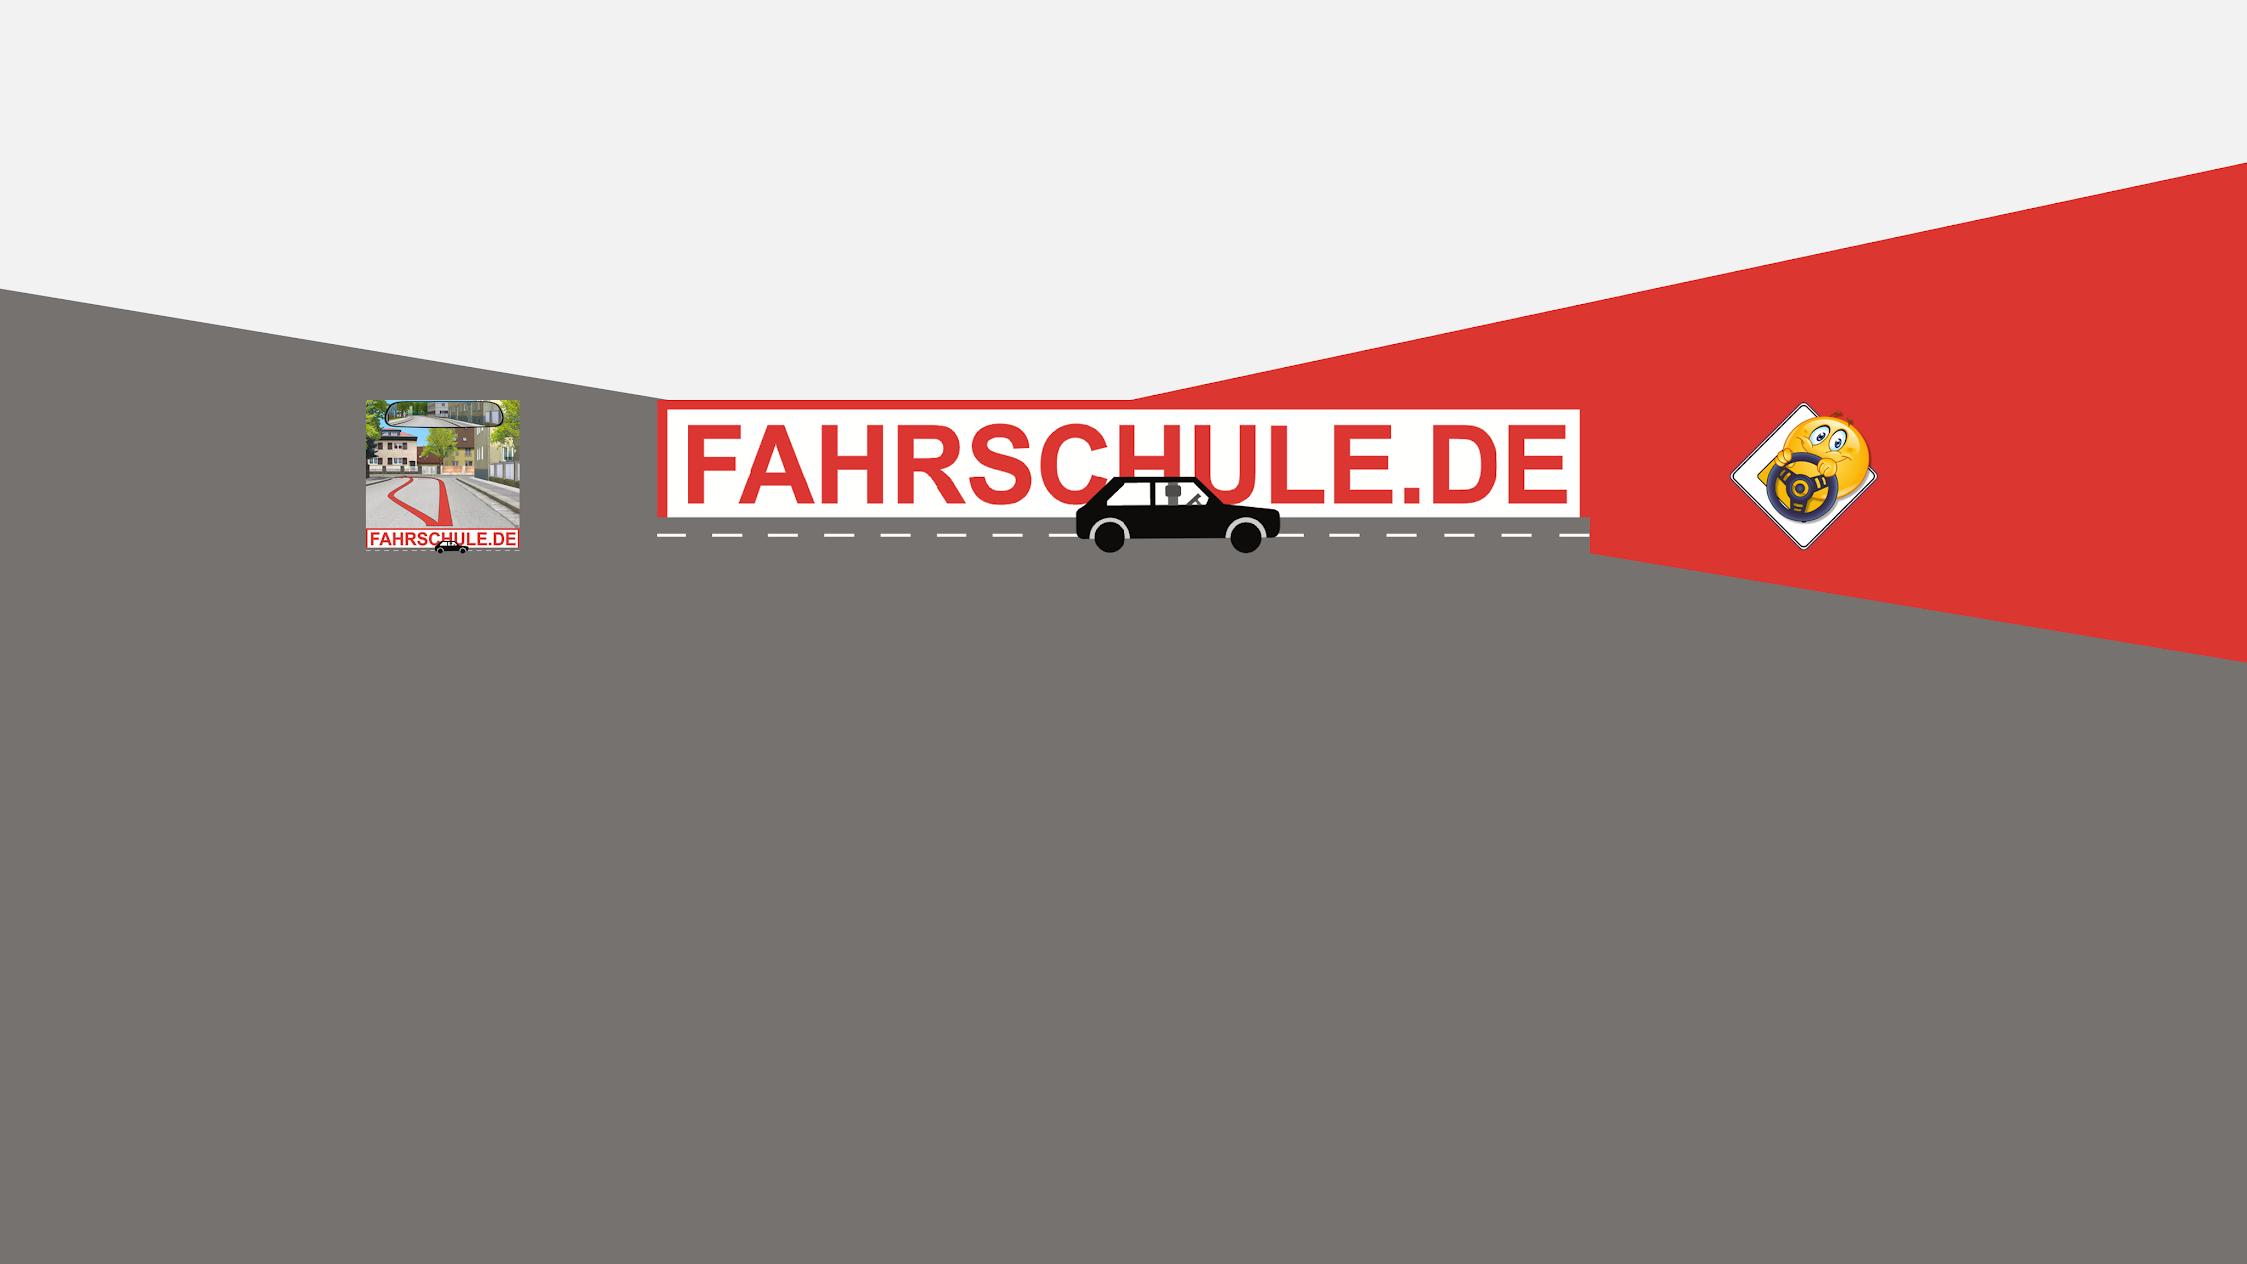 Fahrschule.de Internetdienste GmbH